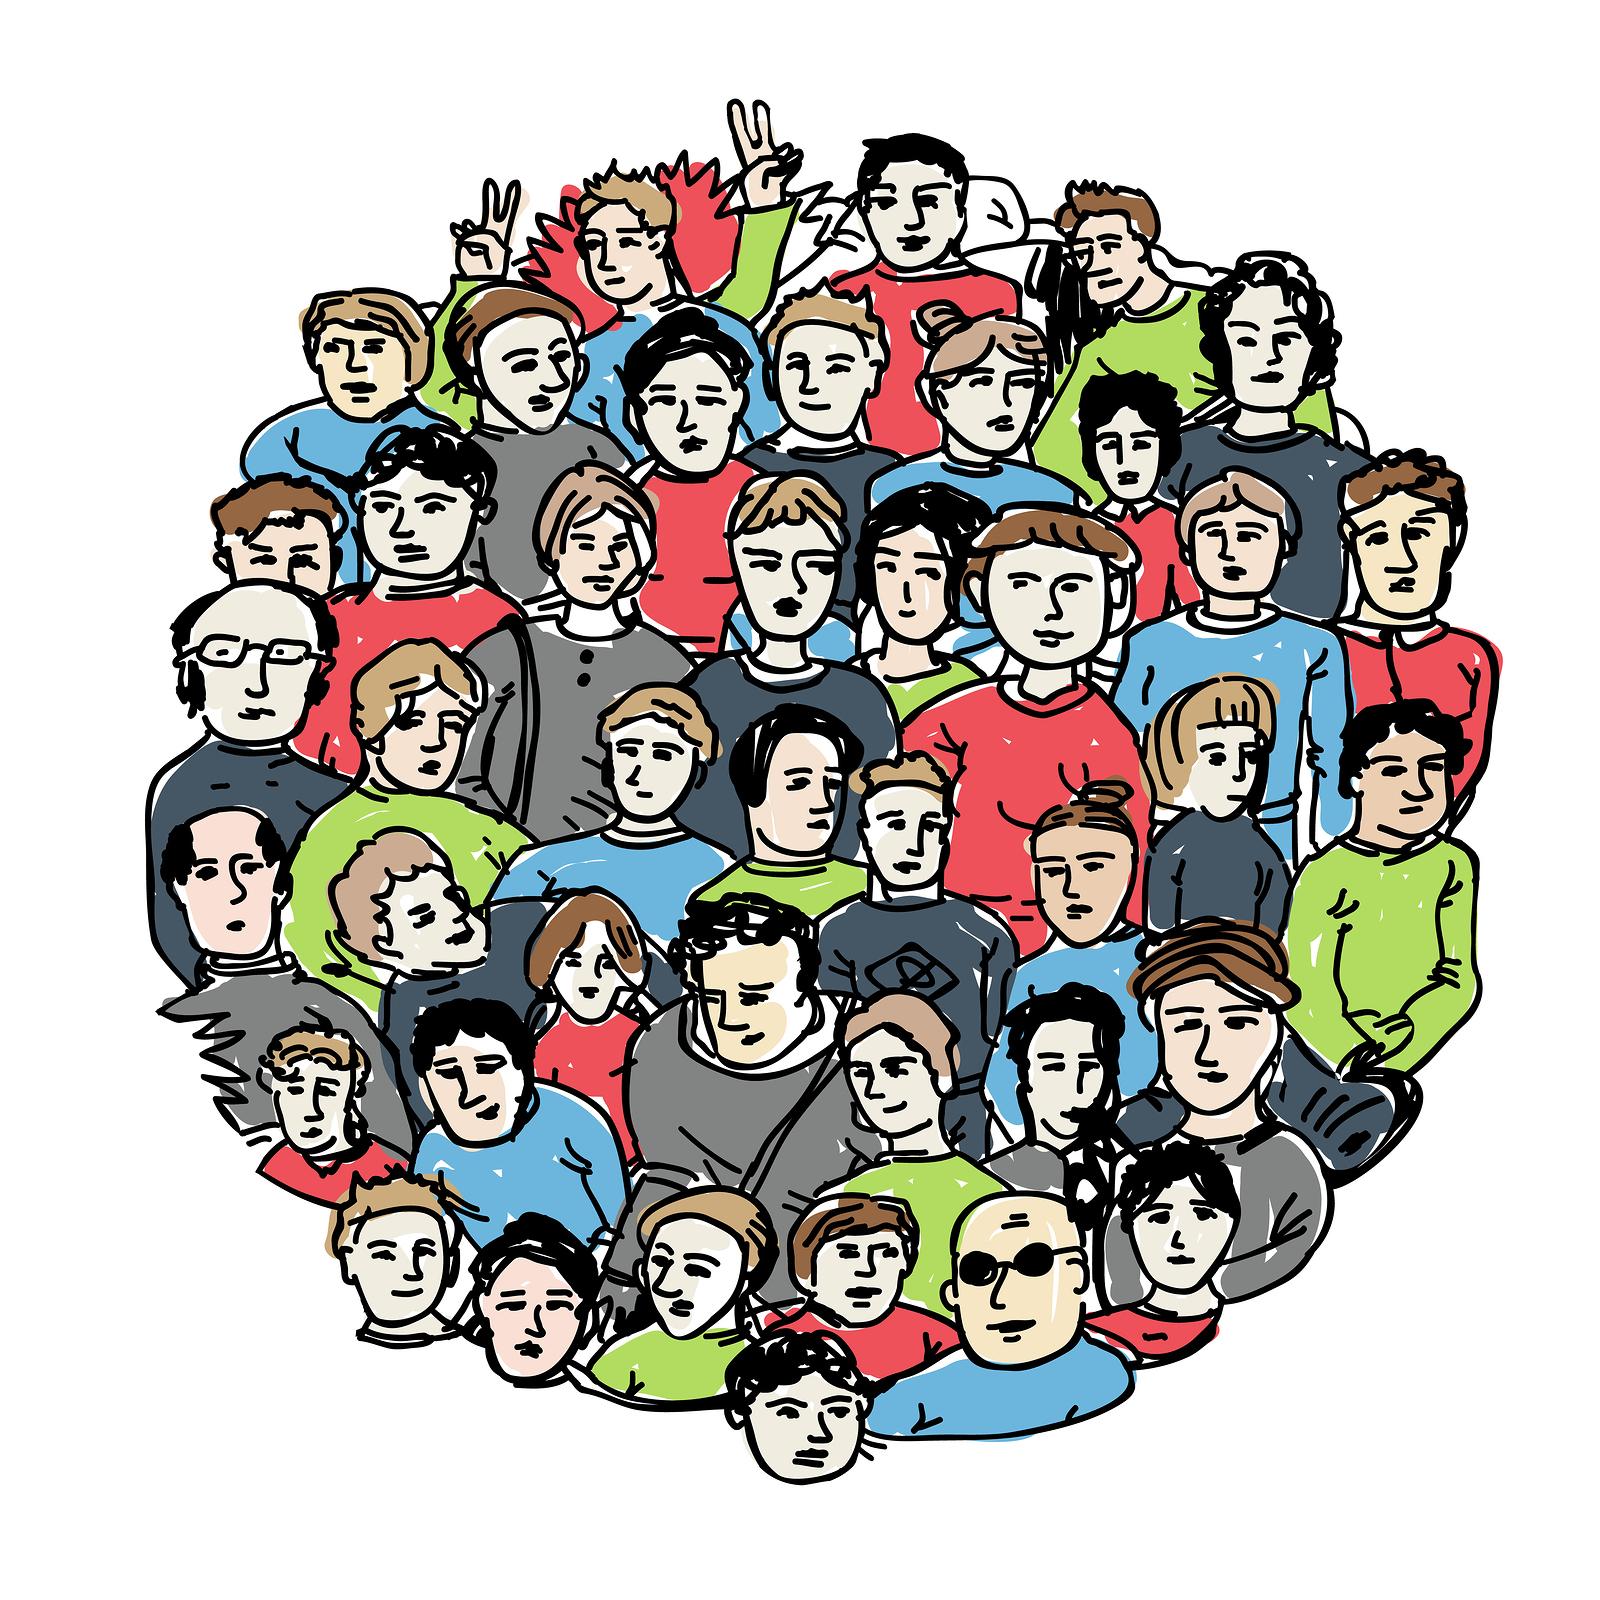 bigstock-Hand-Drawn-People-Crowd-Raste-122475761.jpg